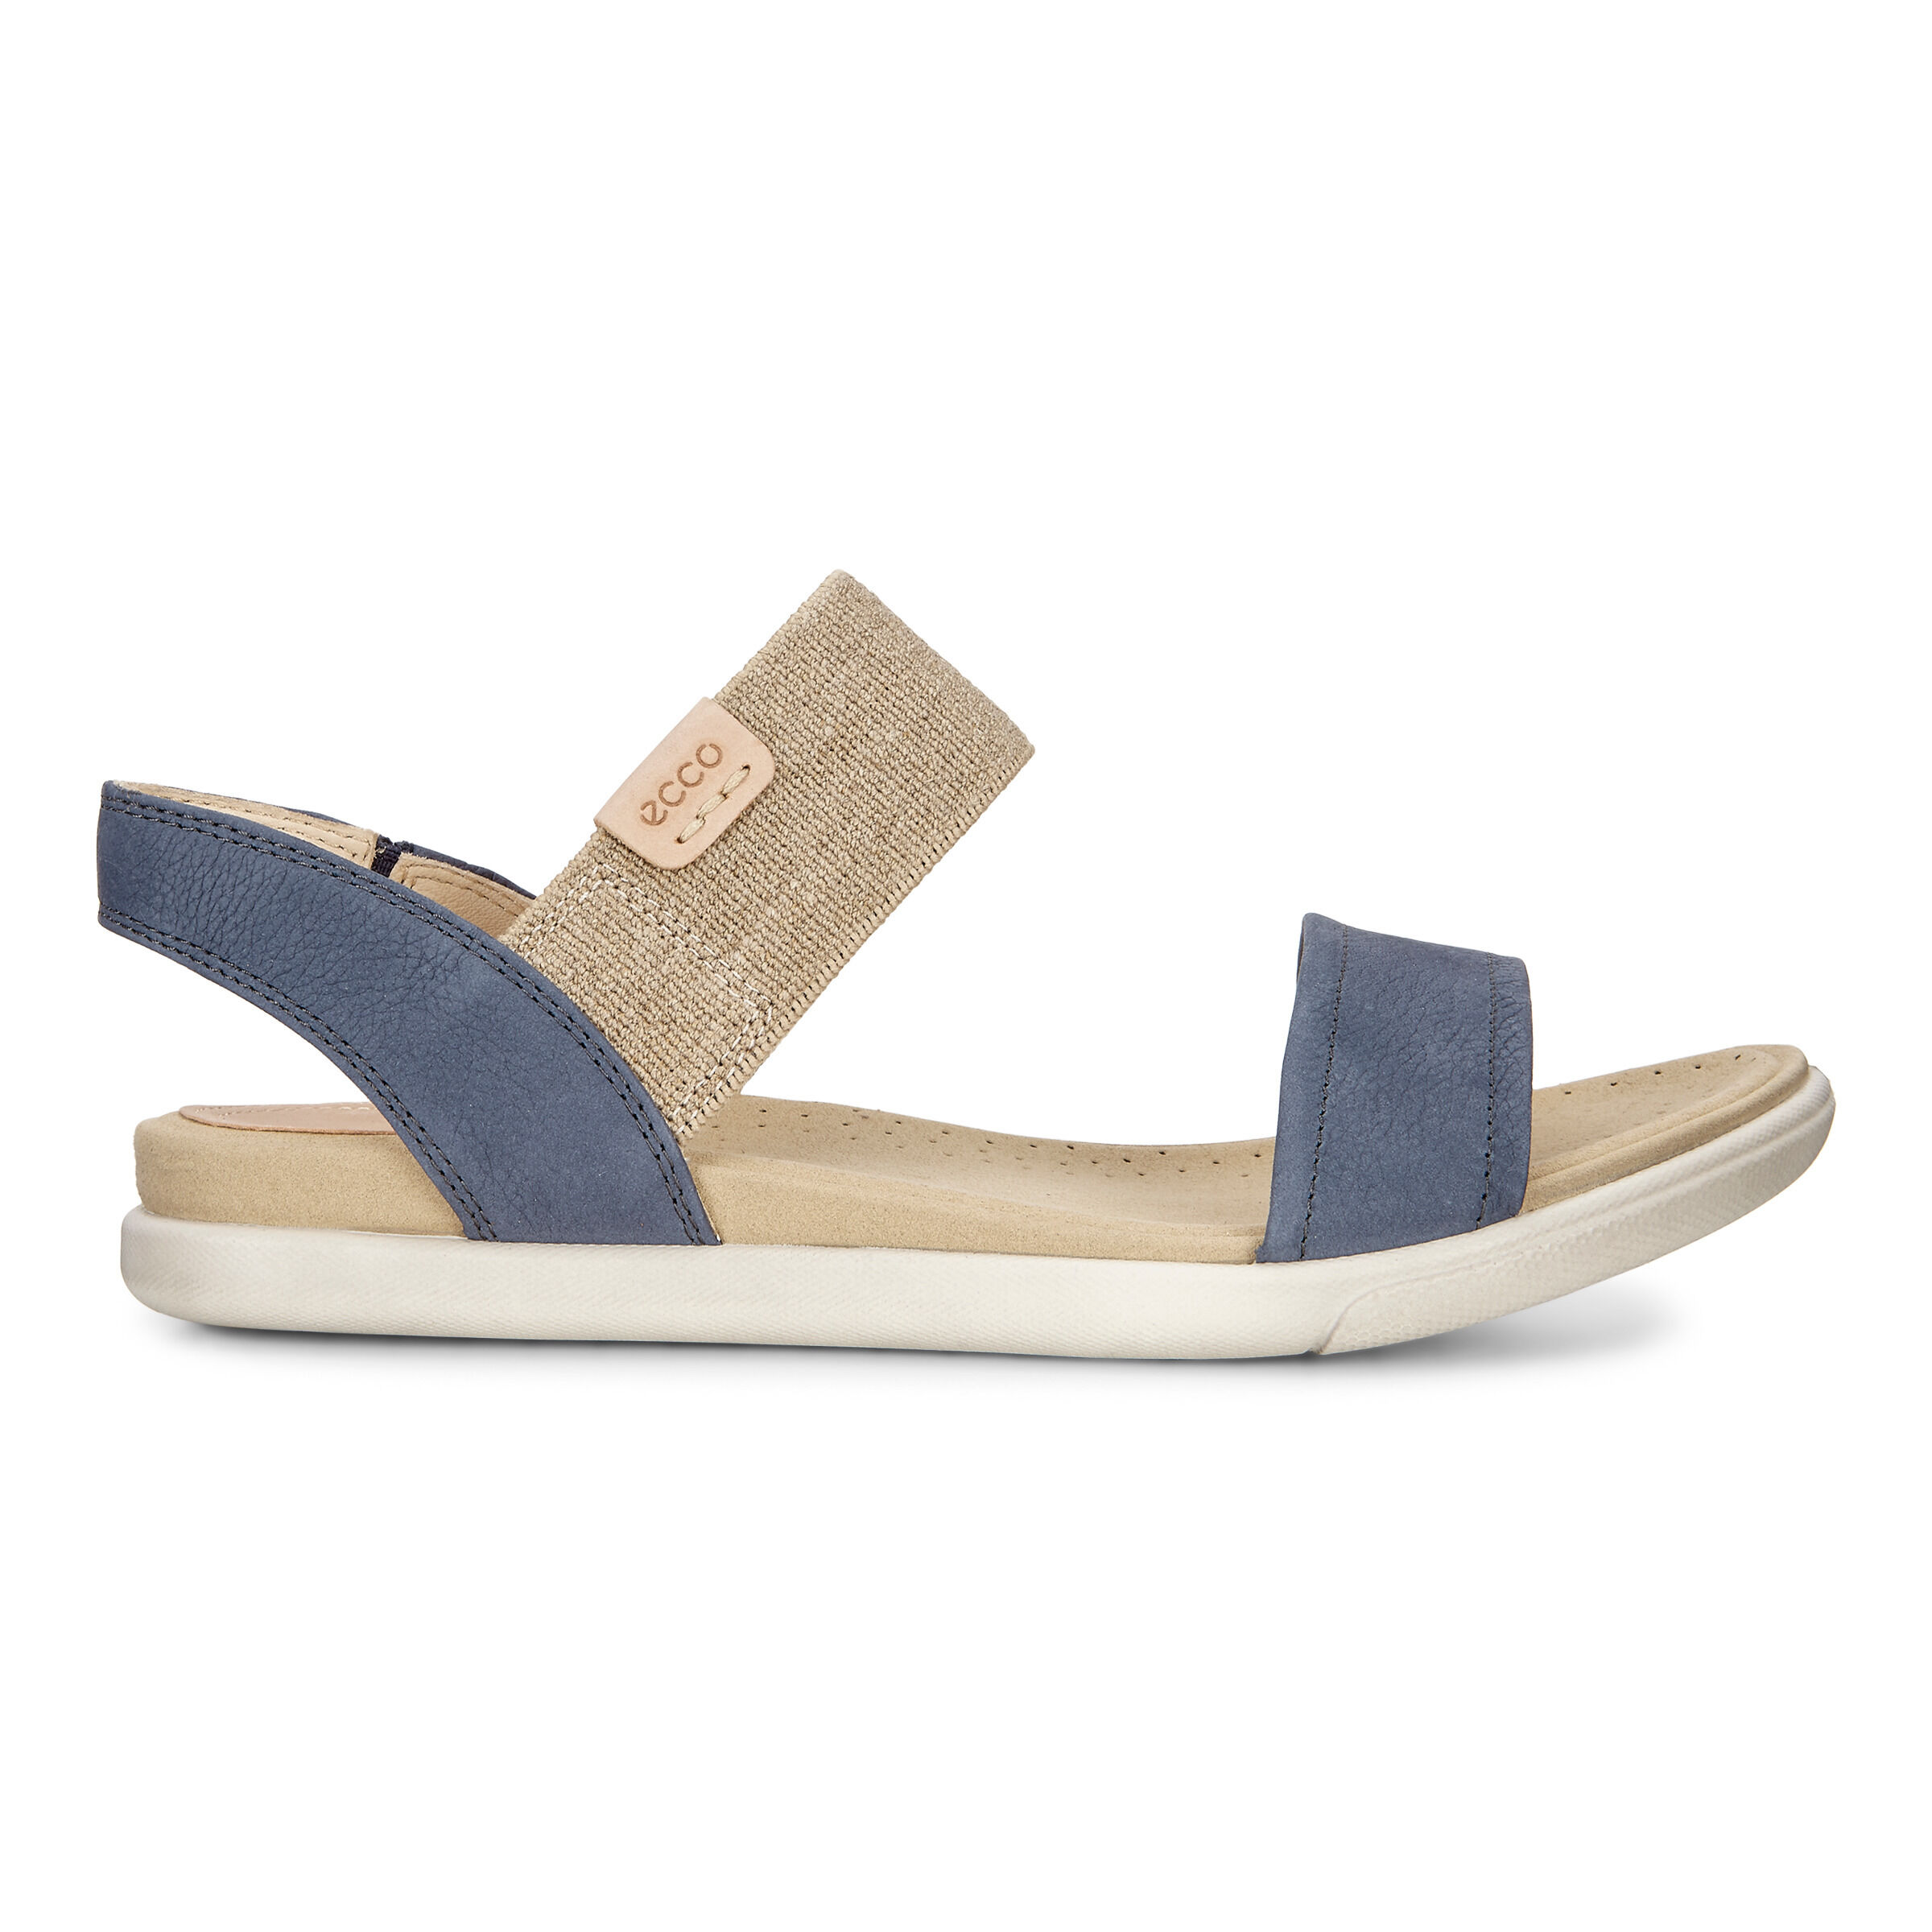 ECCO Damara Ankle Sandal | Women's Casual Sandals | ECCO® Shoes